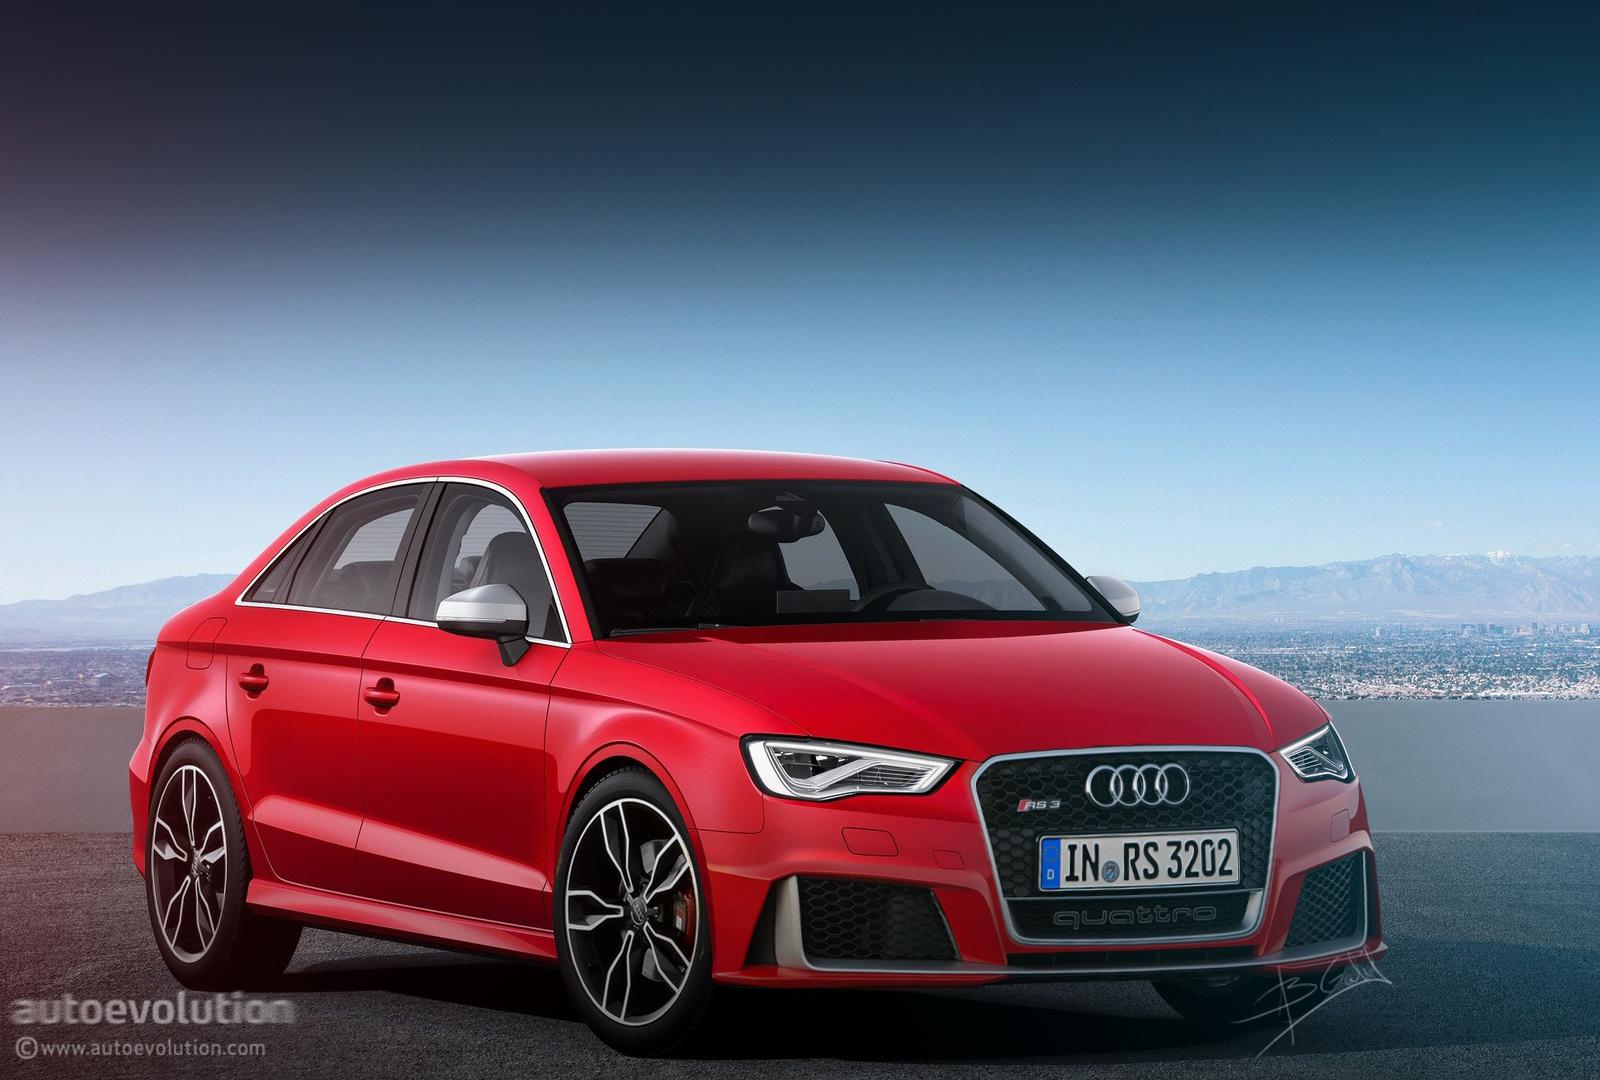 Audi Rs3 Sedan Coming In 2016 Autoevolution